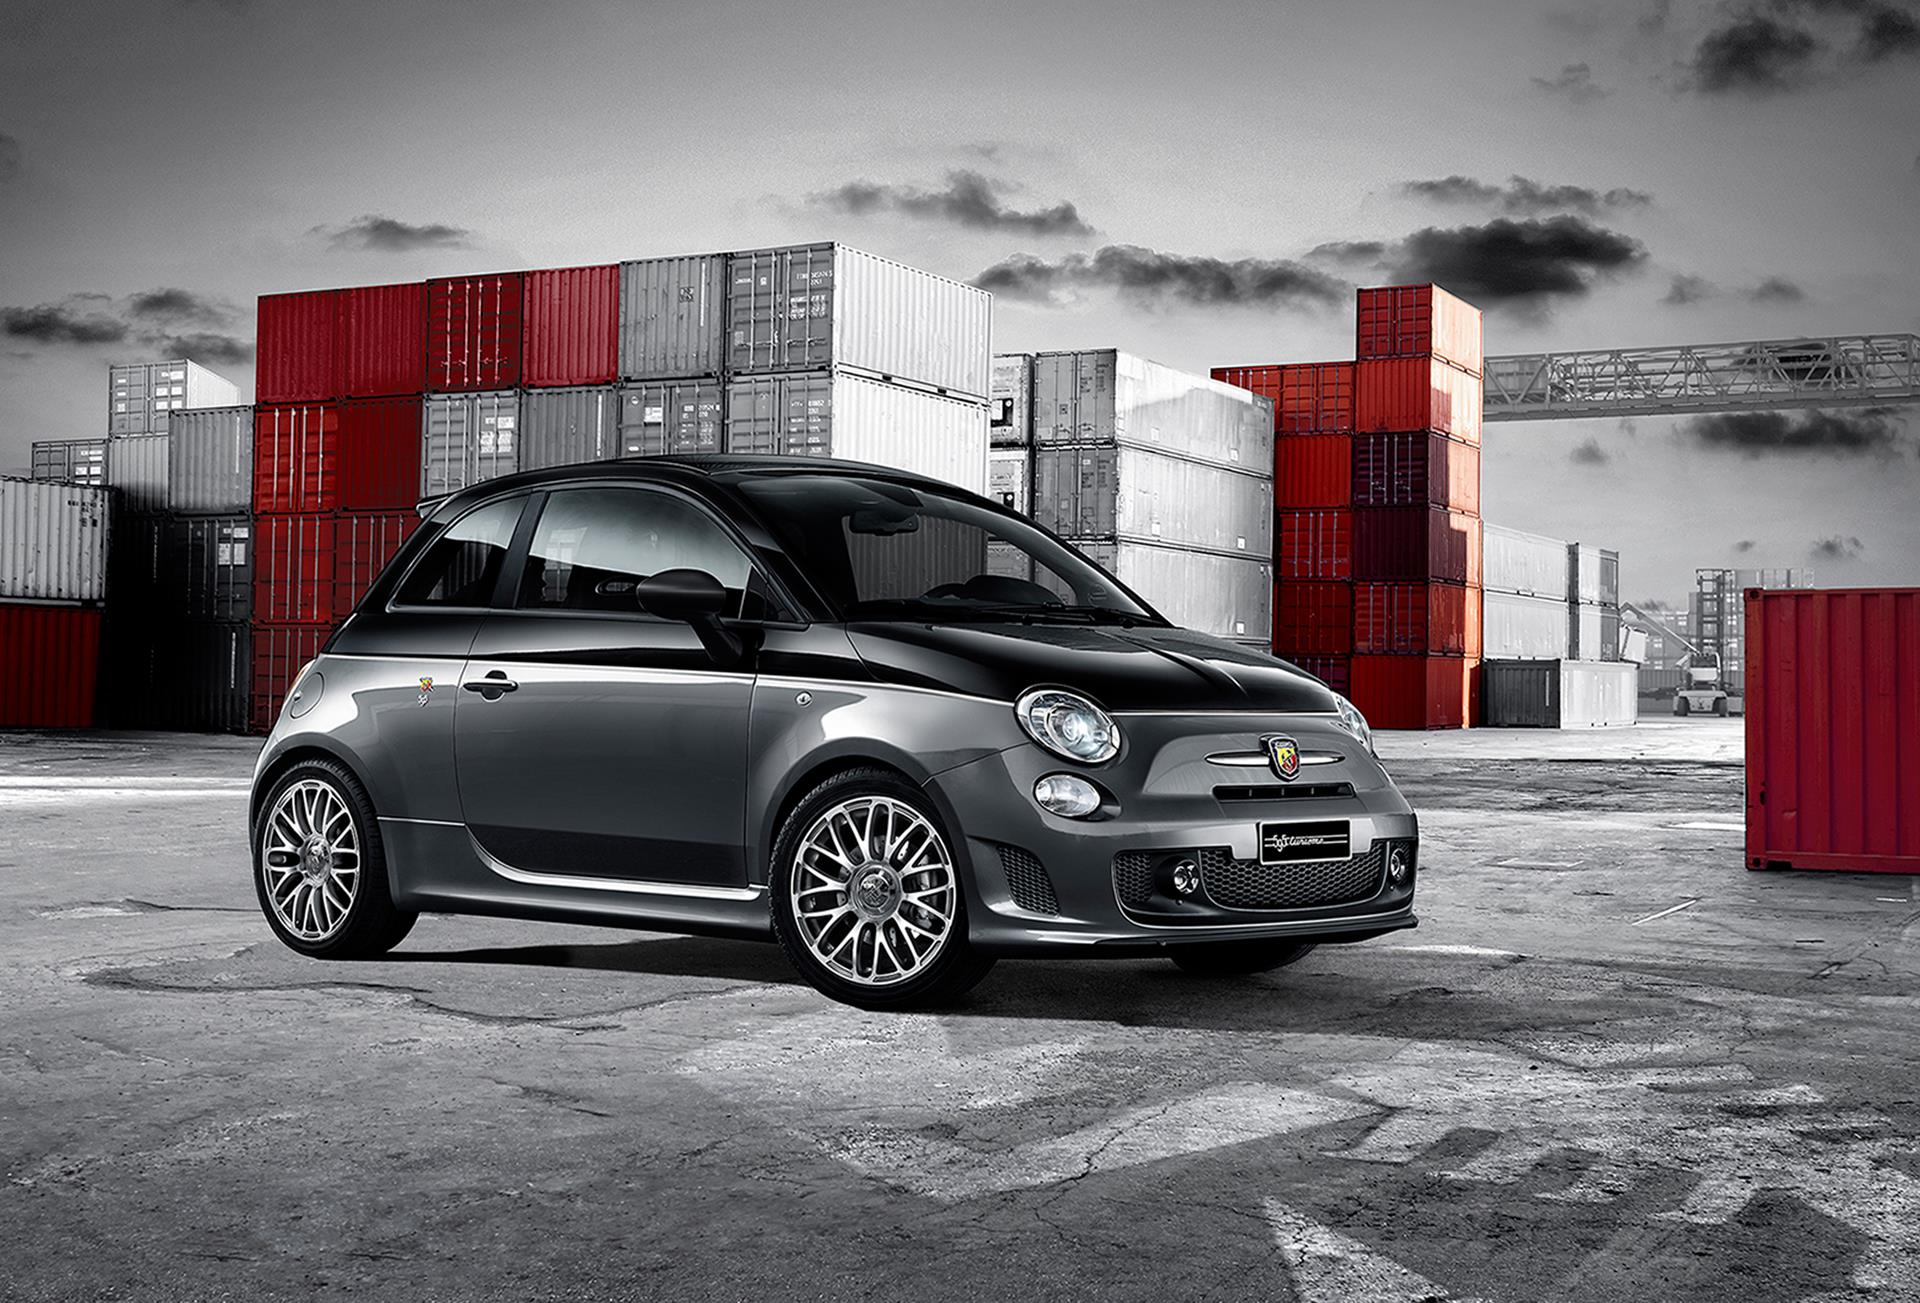 Gucci Fiat 500 >> 2015 Fiat 500 Bi-Colore Edition News and Information